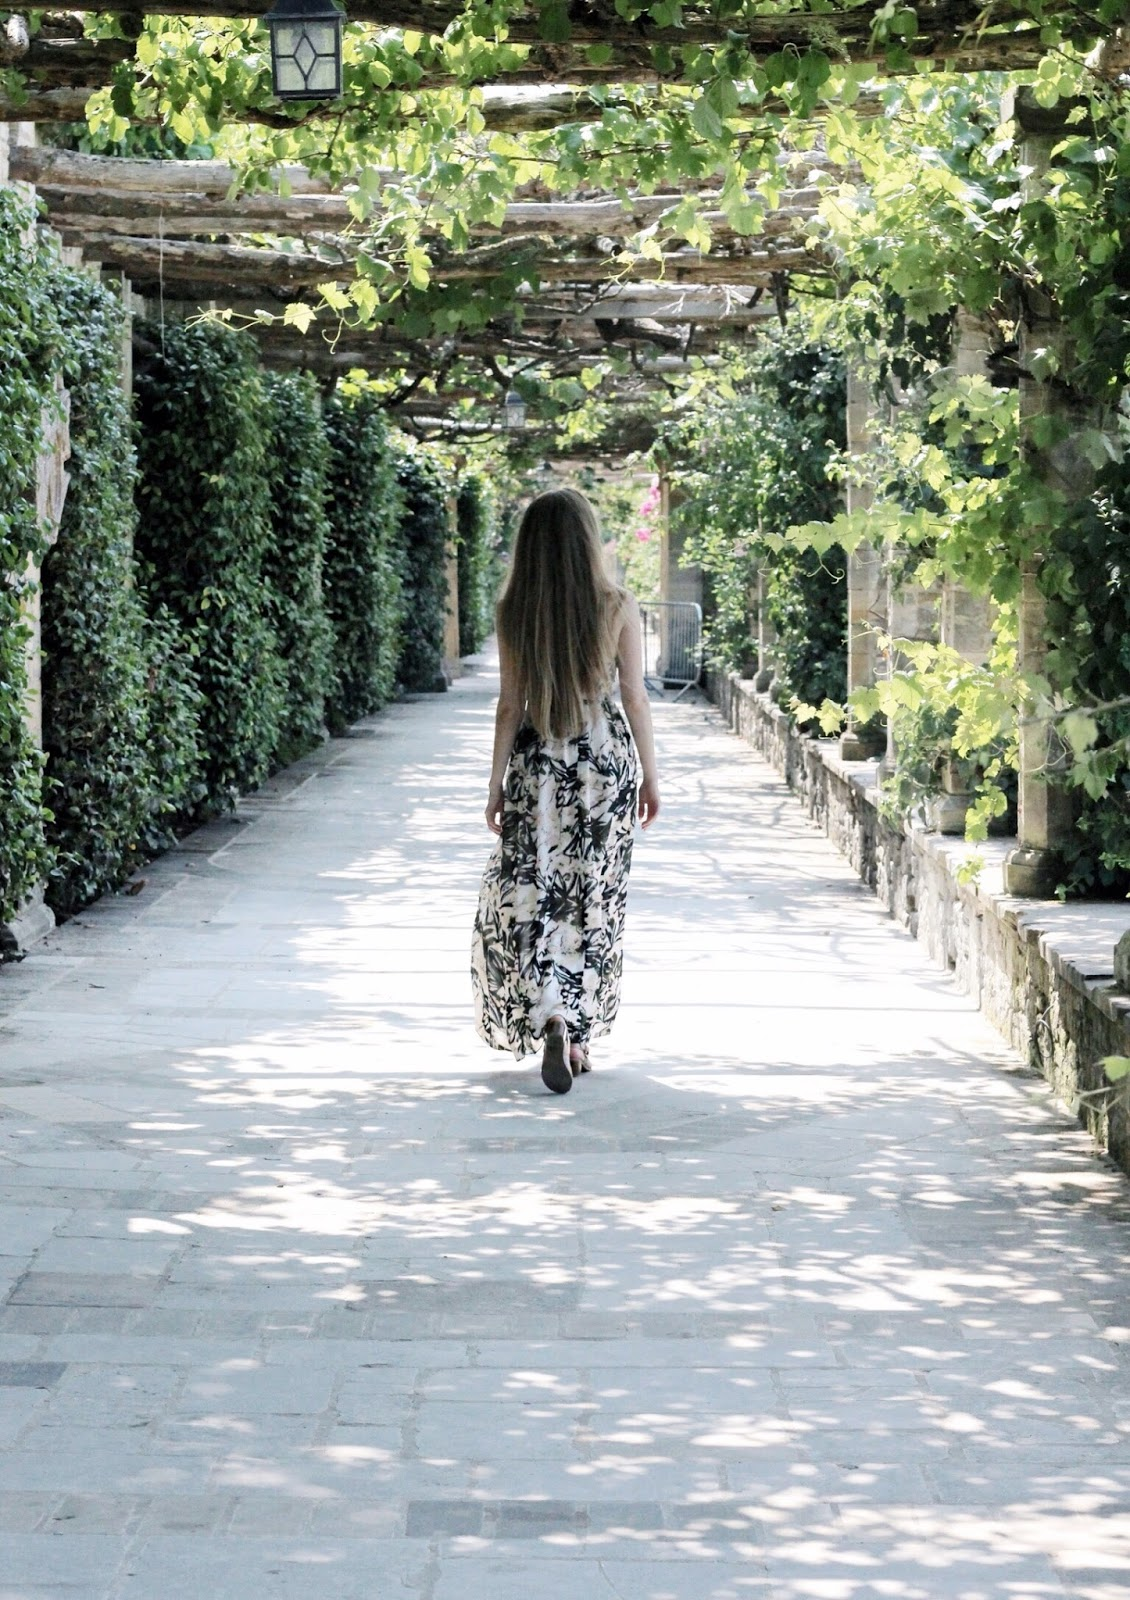 Walking through Italian Gardens at Hever Castle